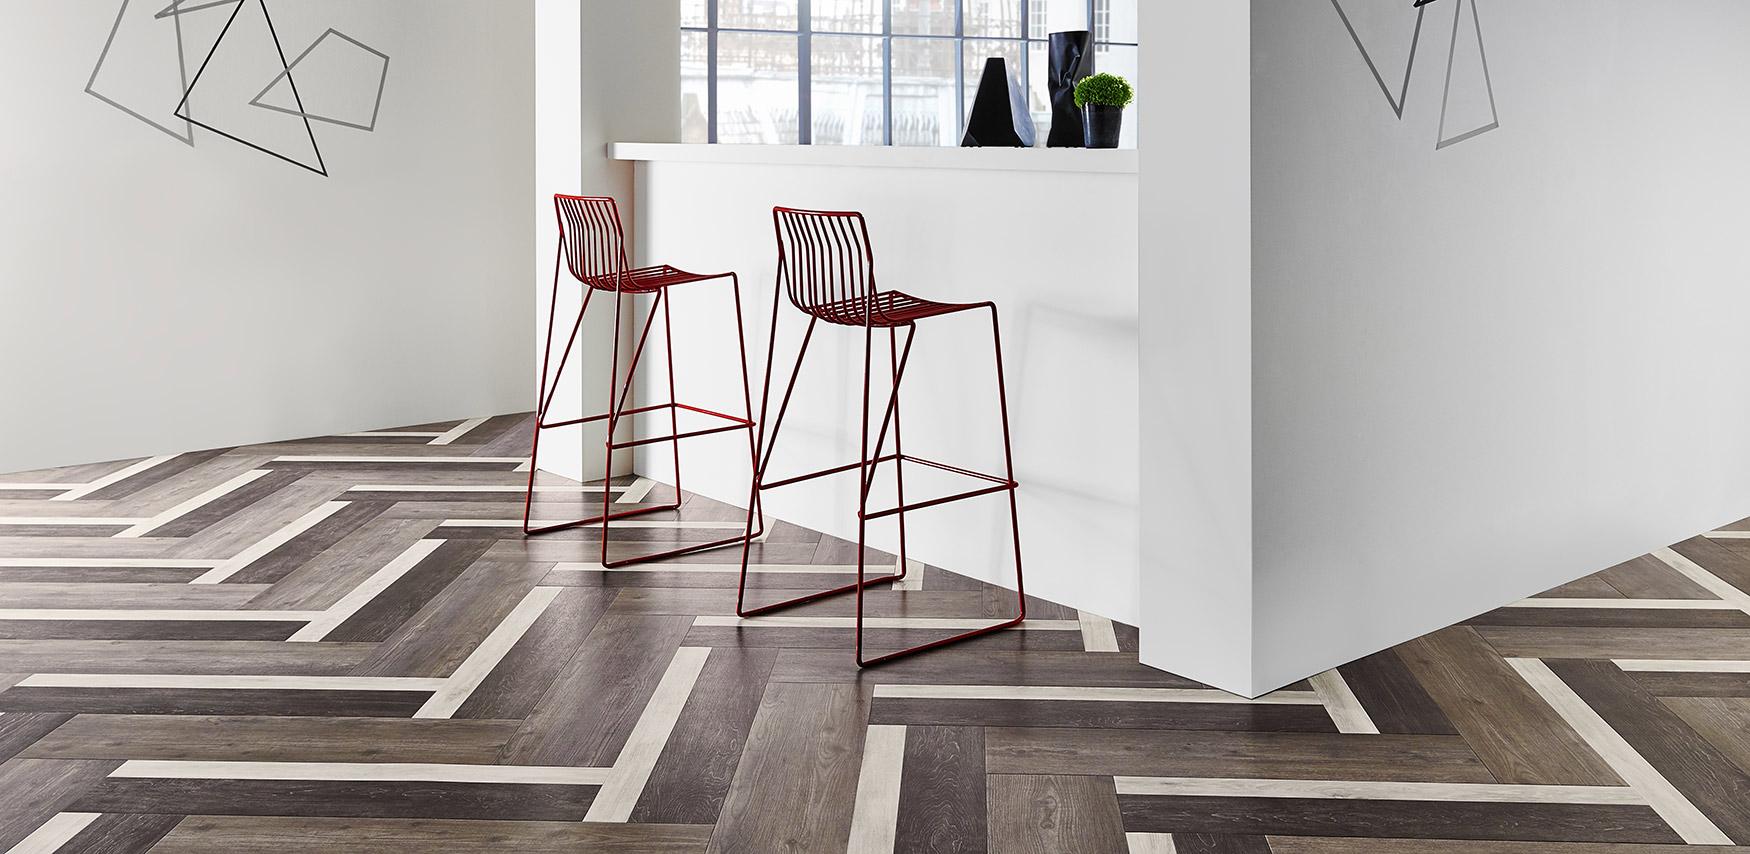 Office Flooring Fitters In London